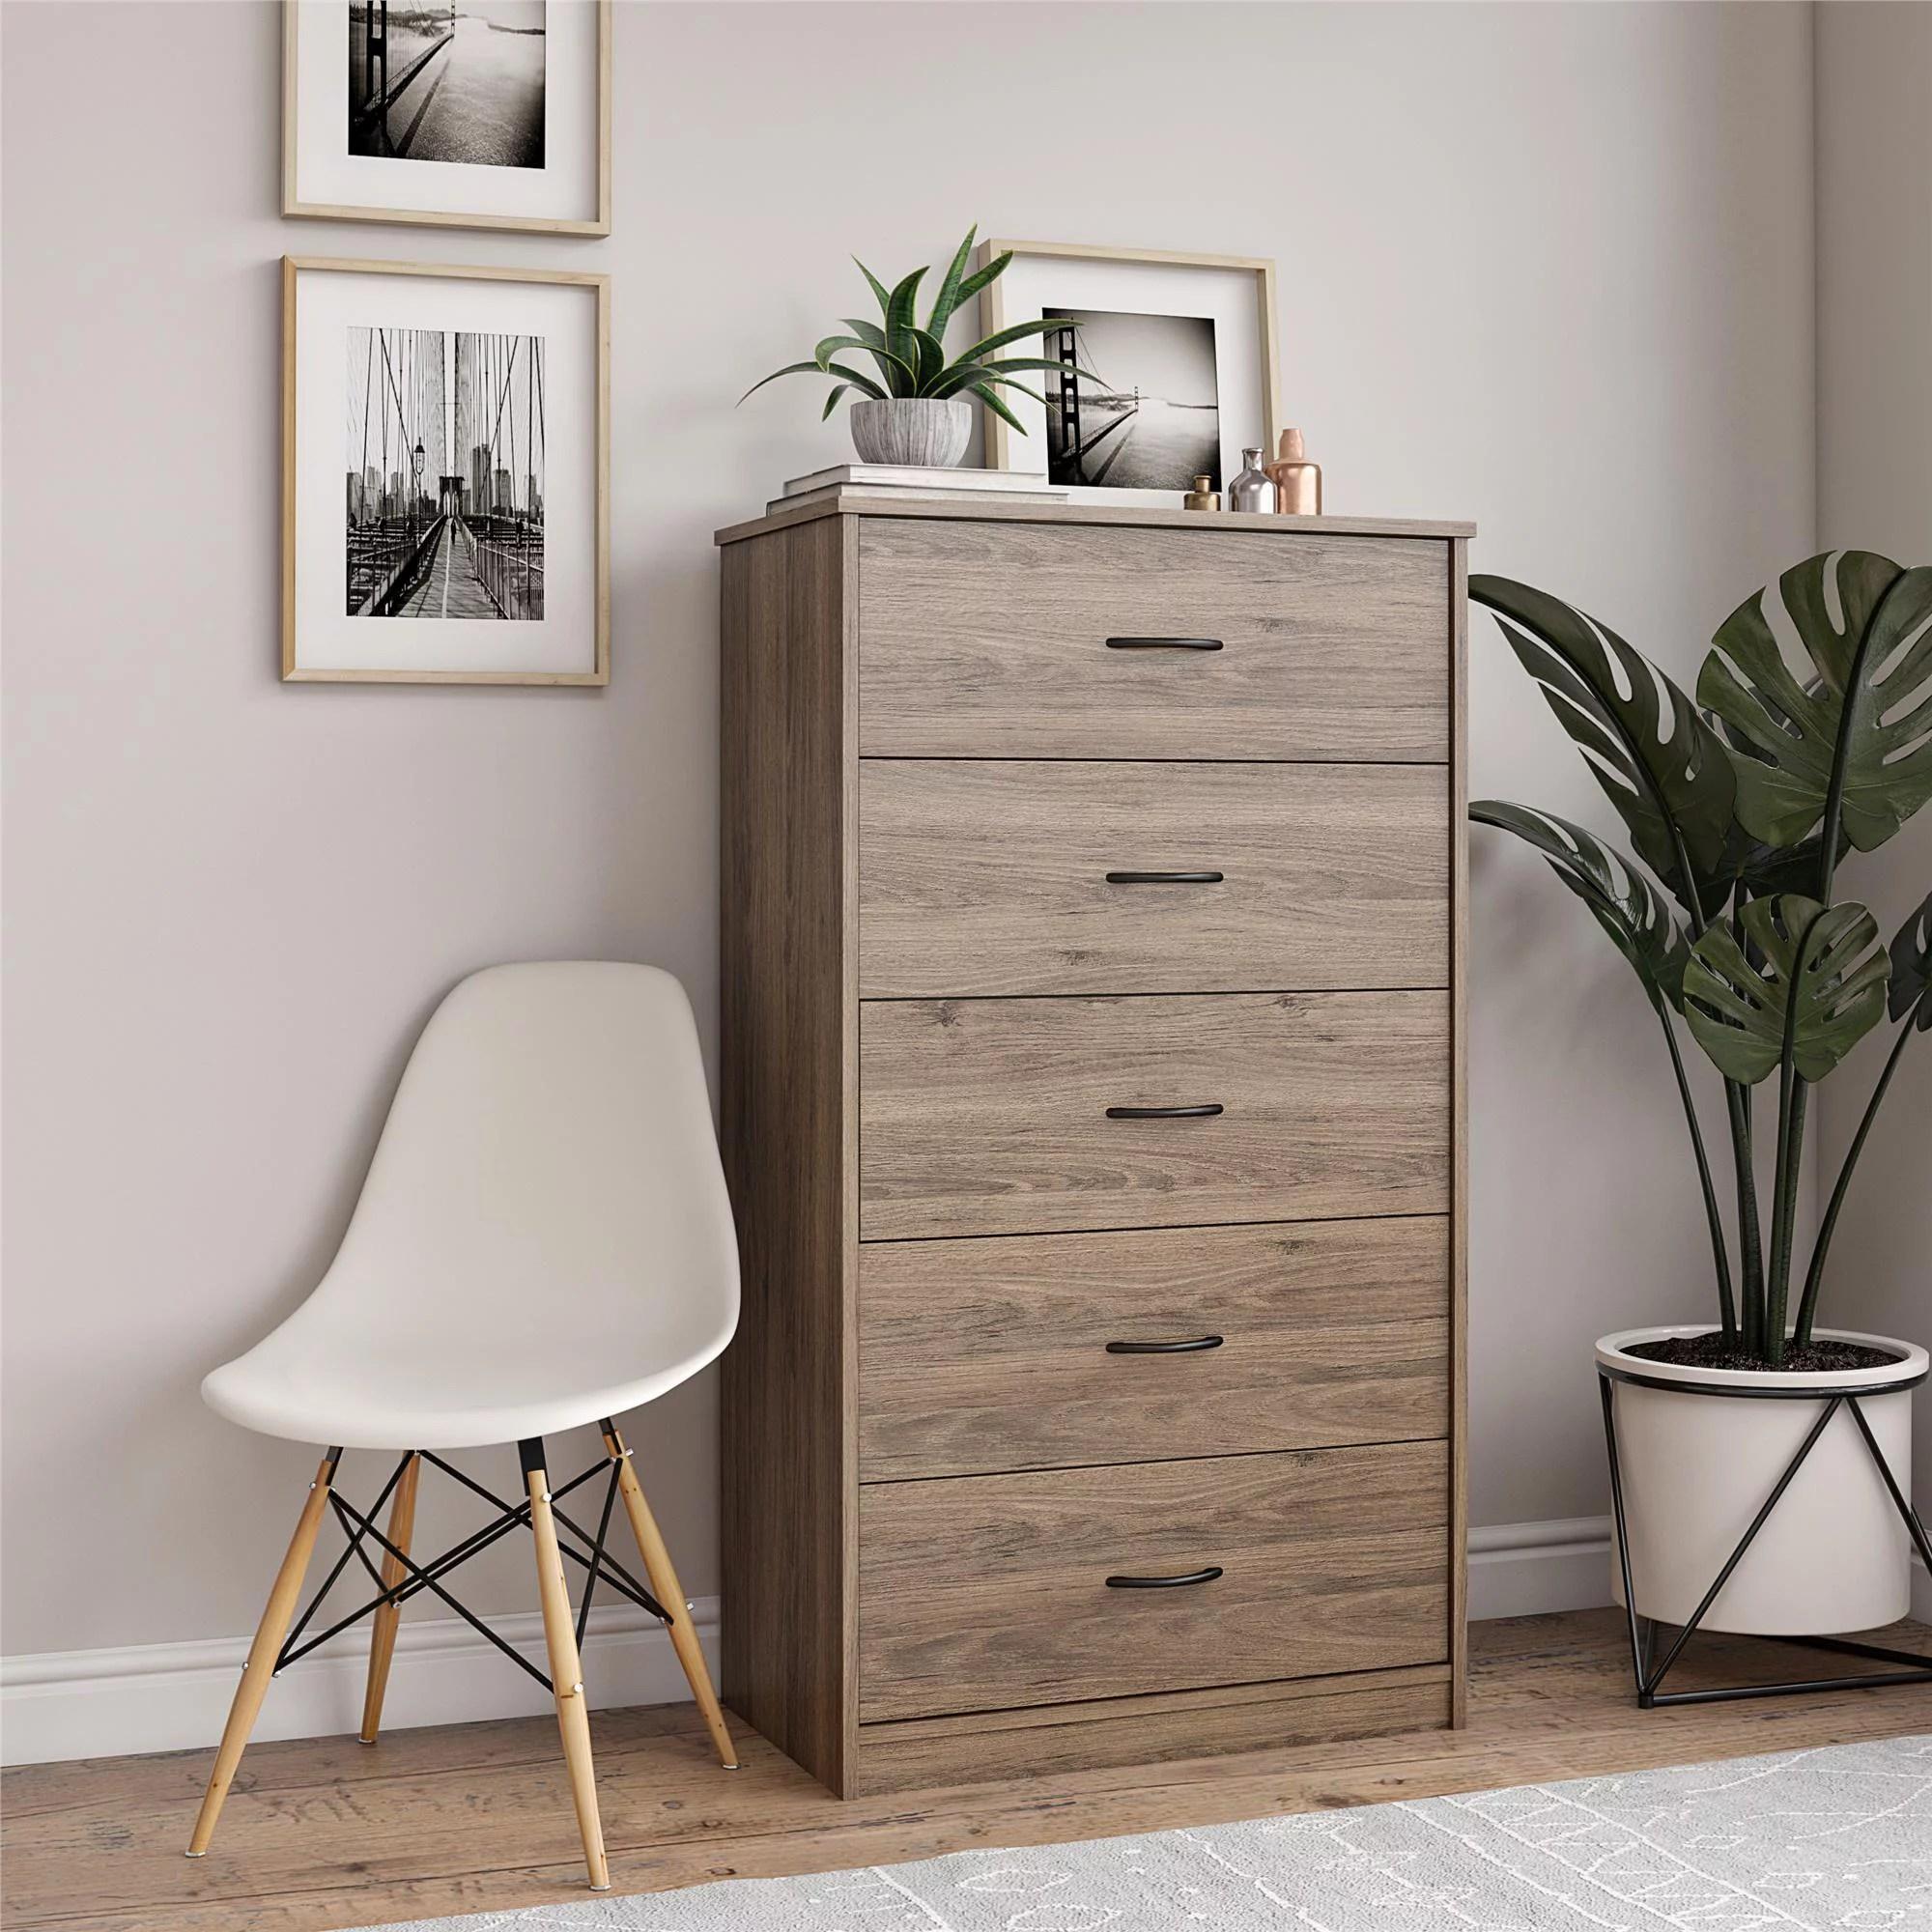 mainstays classic 5 drawer dresser rustic oak finish